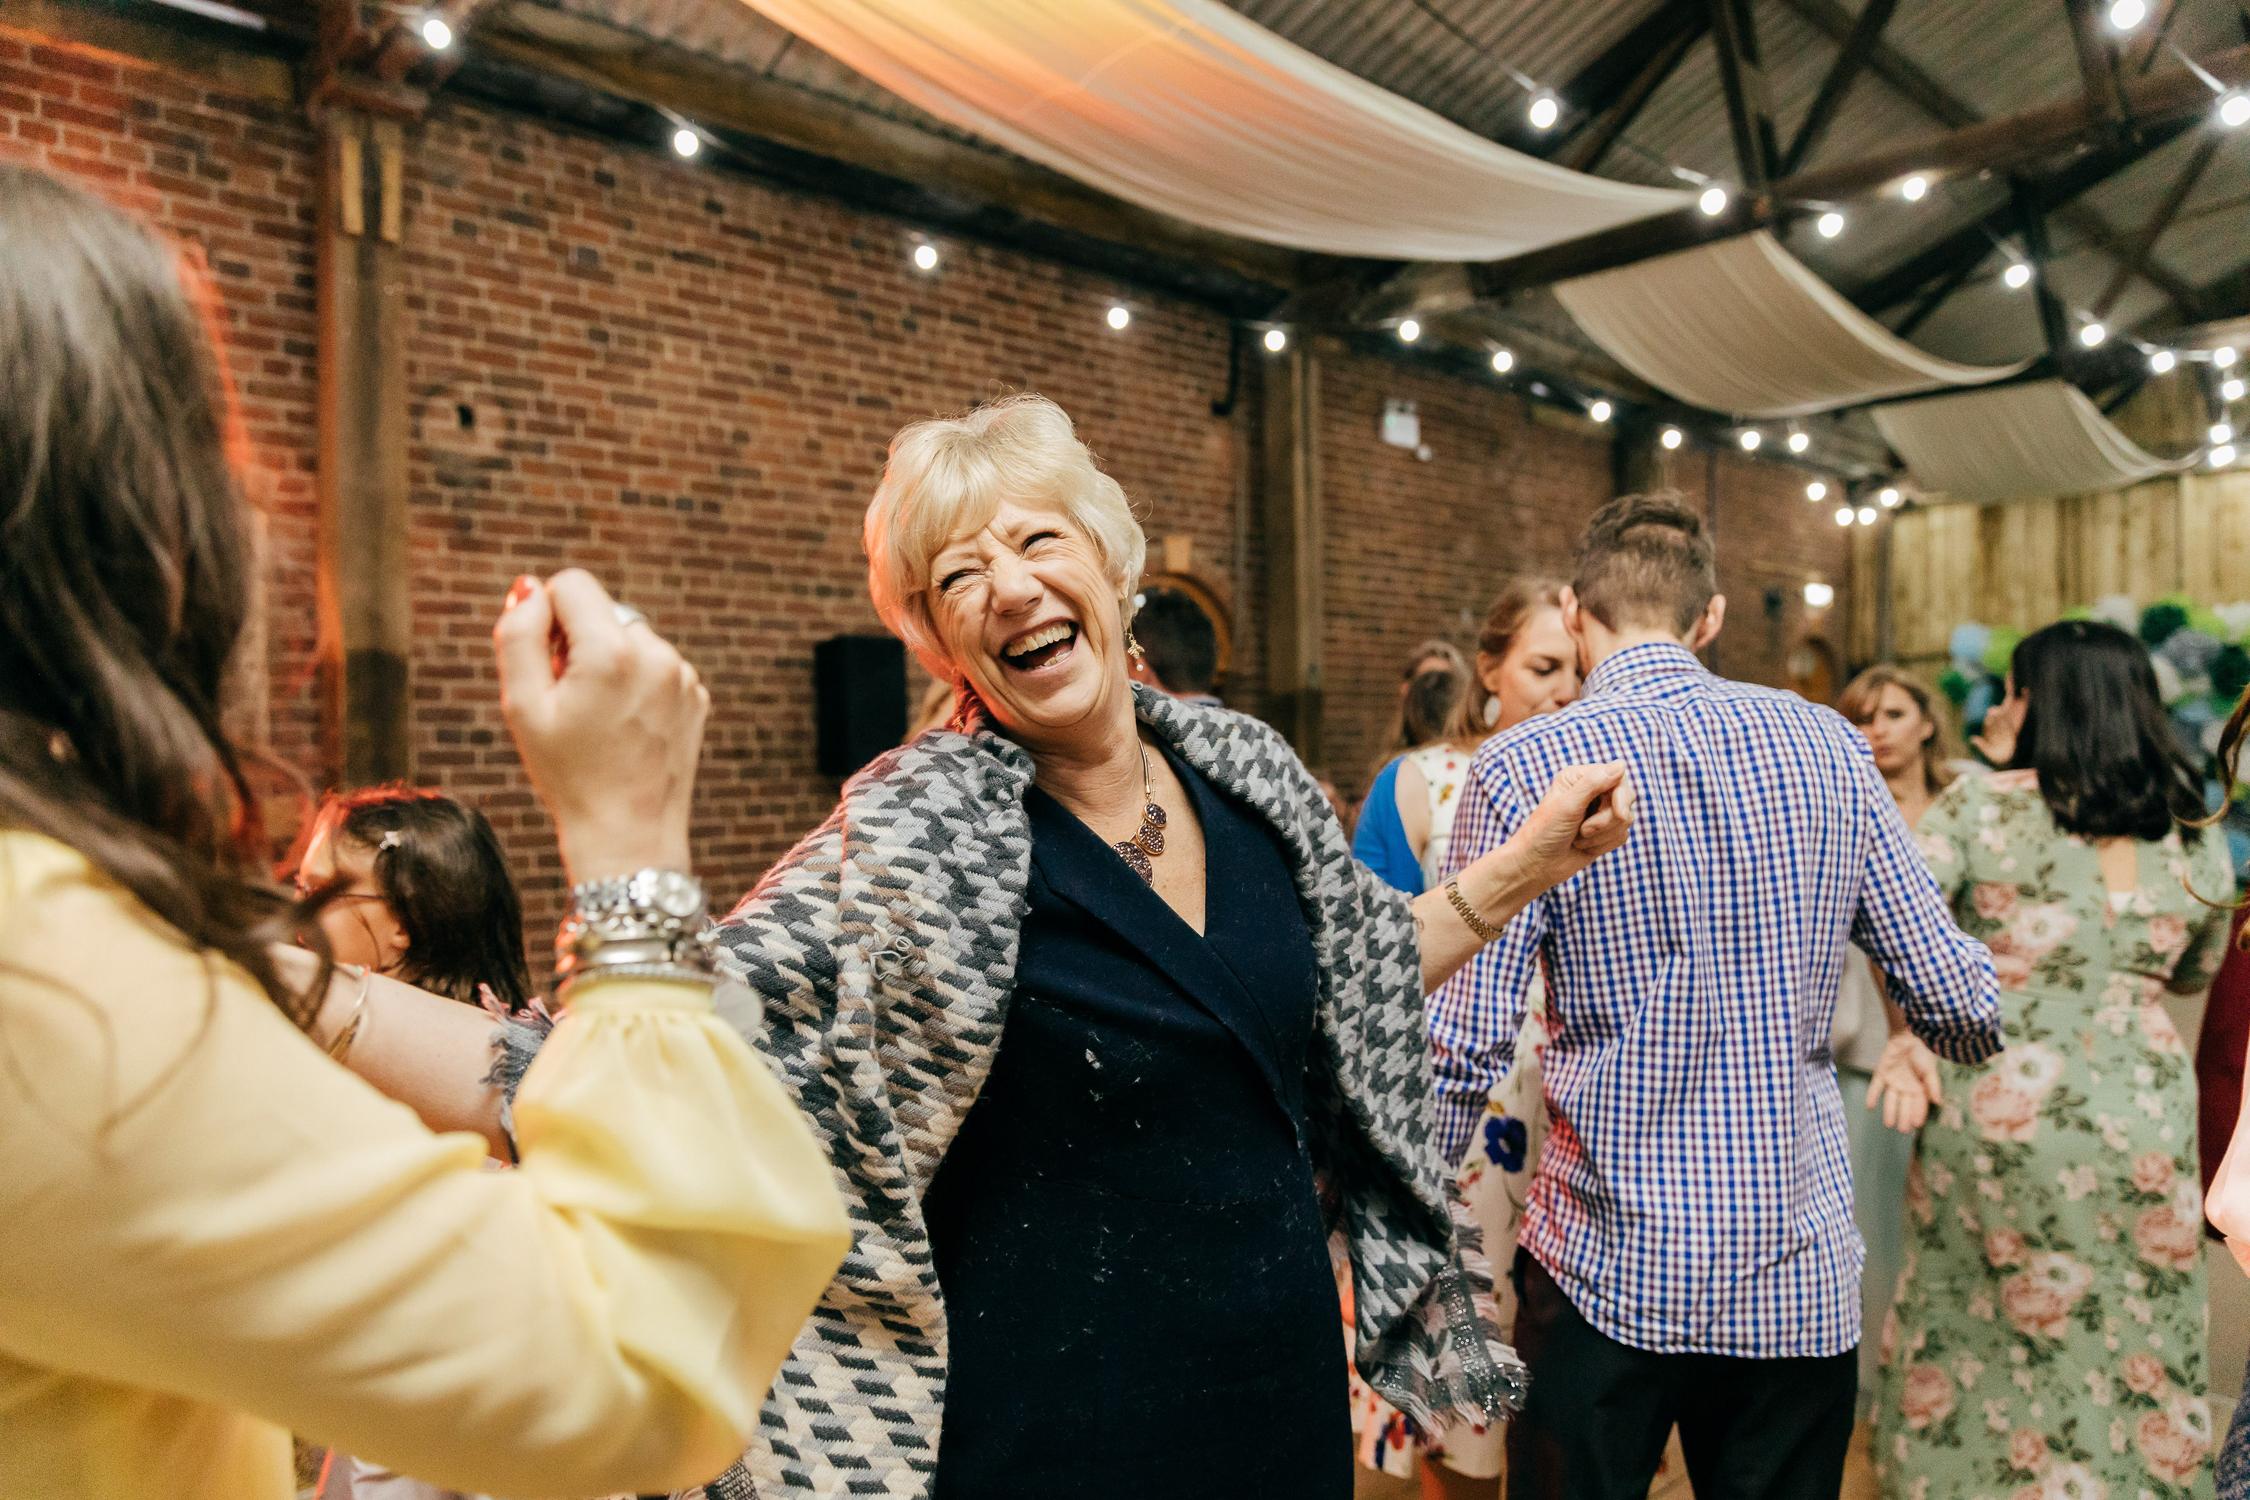 fun and joyful documentary wedding photography of guests dancing